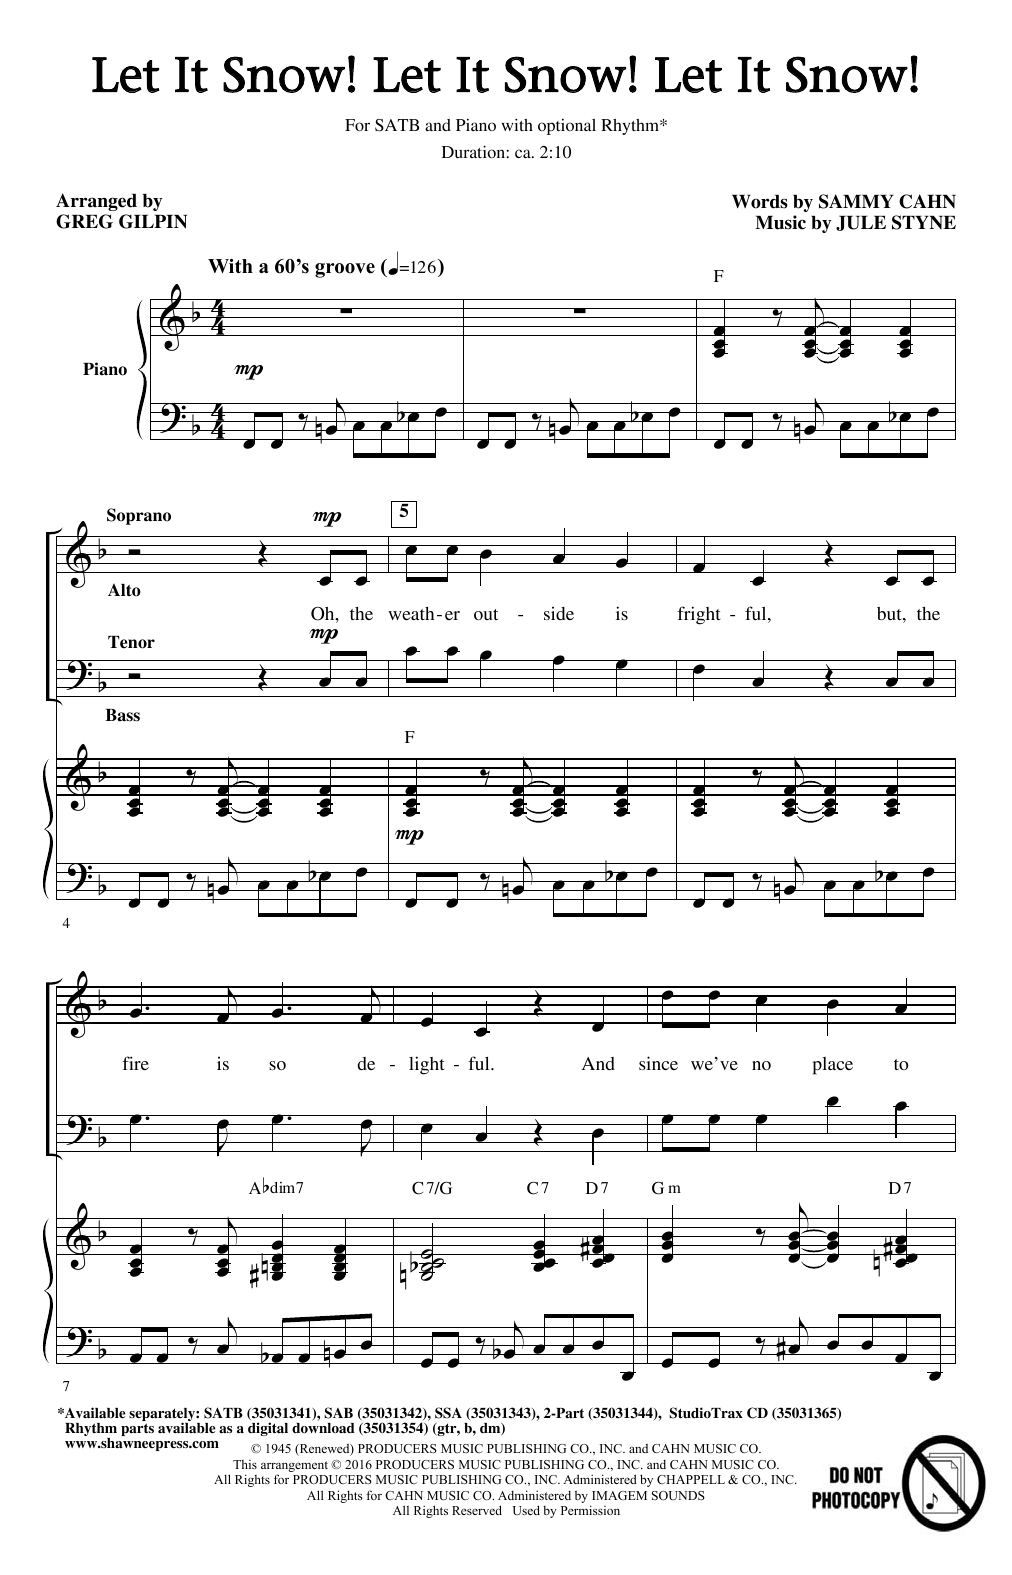 Let It Snow! Let It Snow! Let It Snow! (SATB Choir)